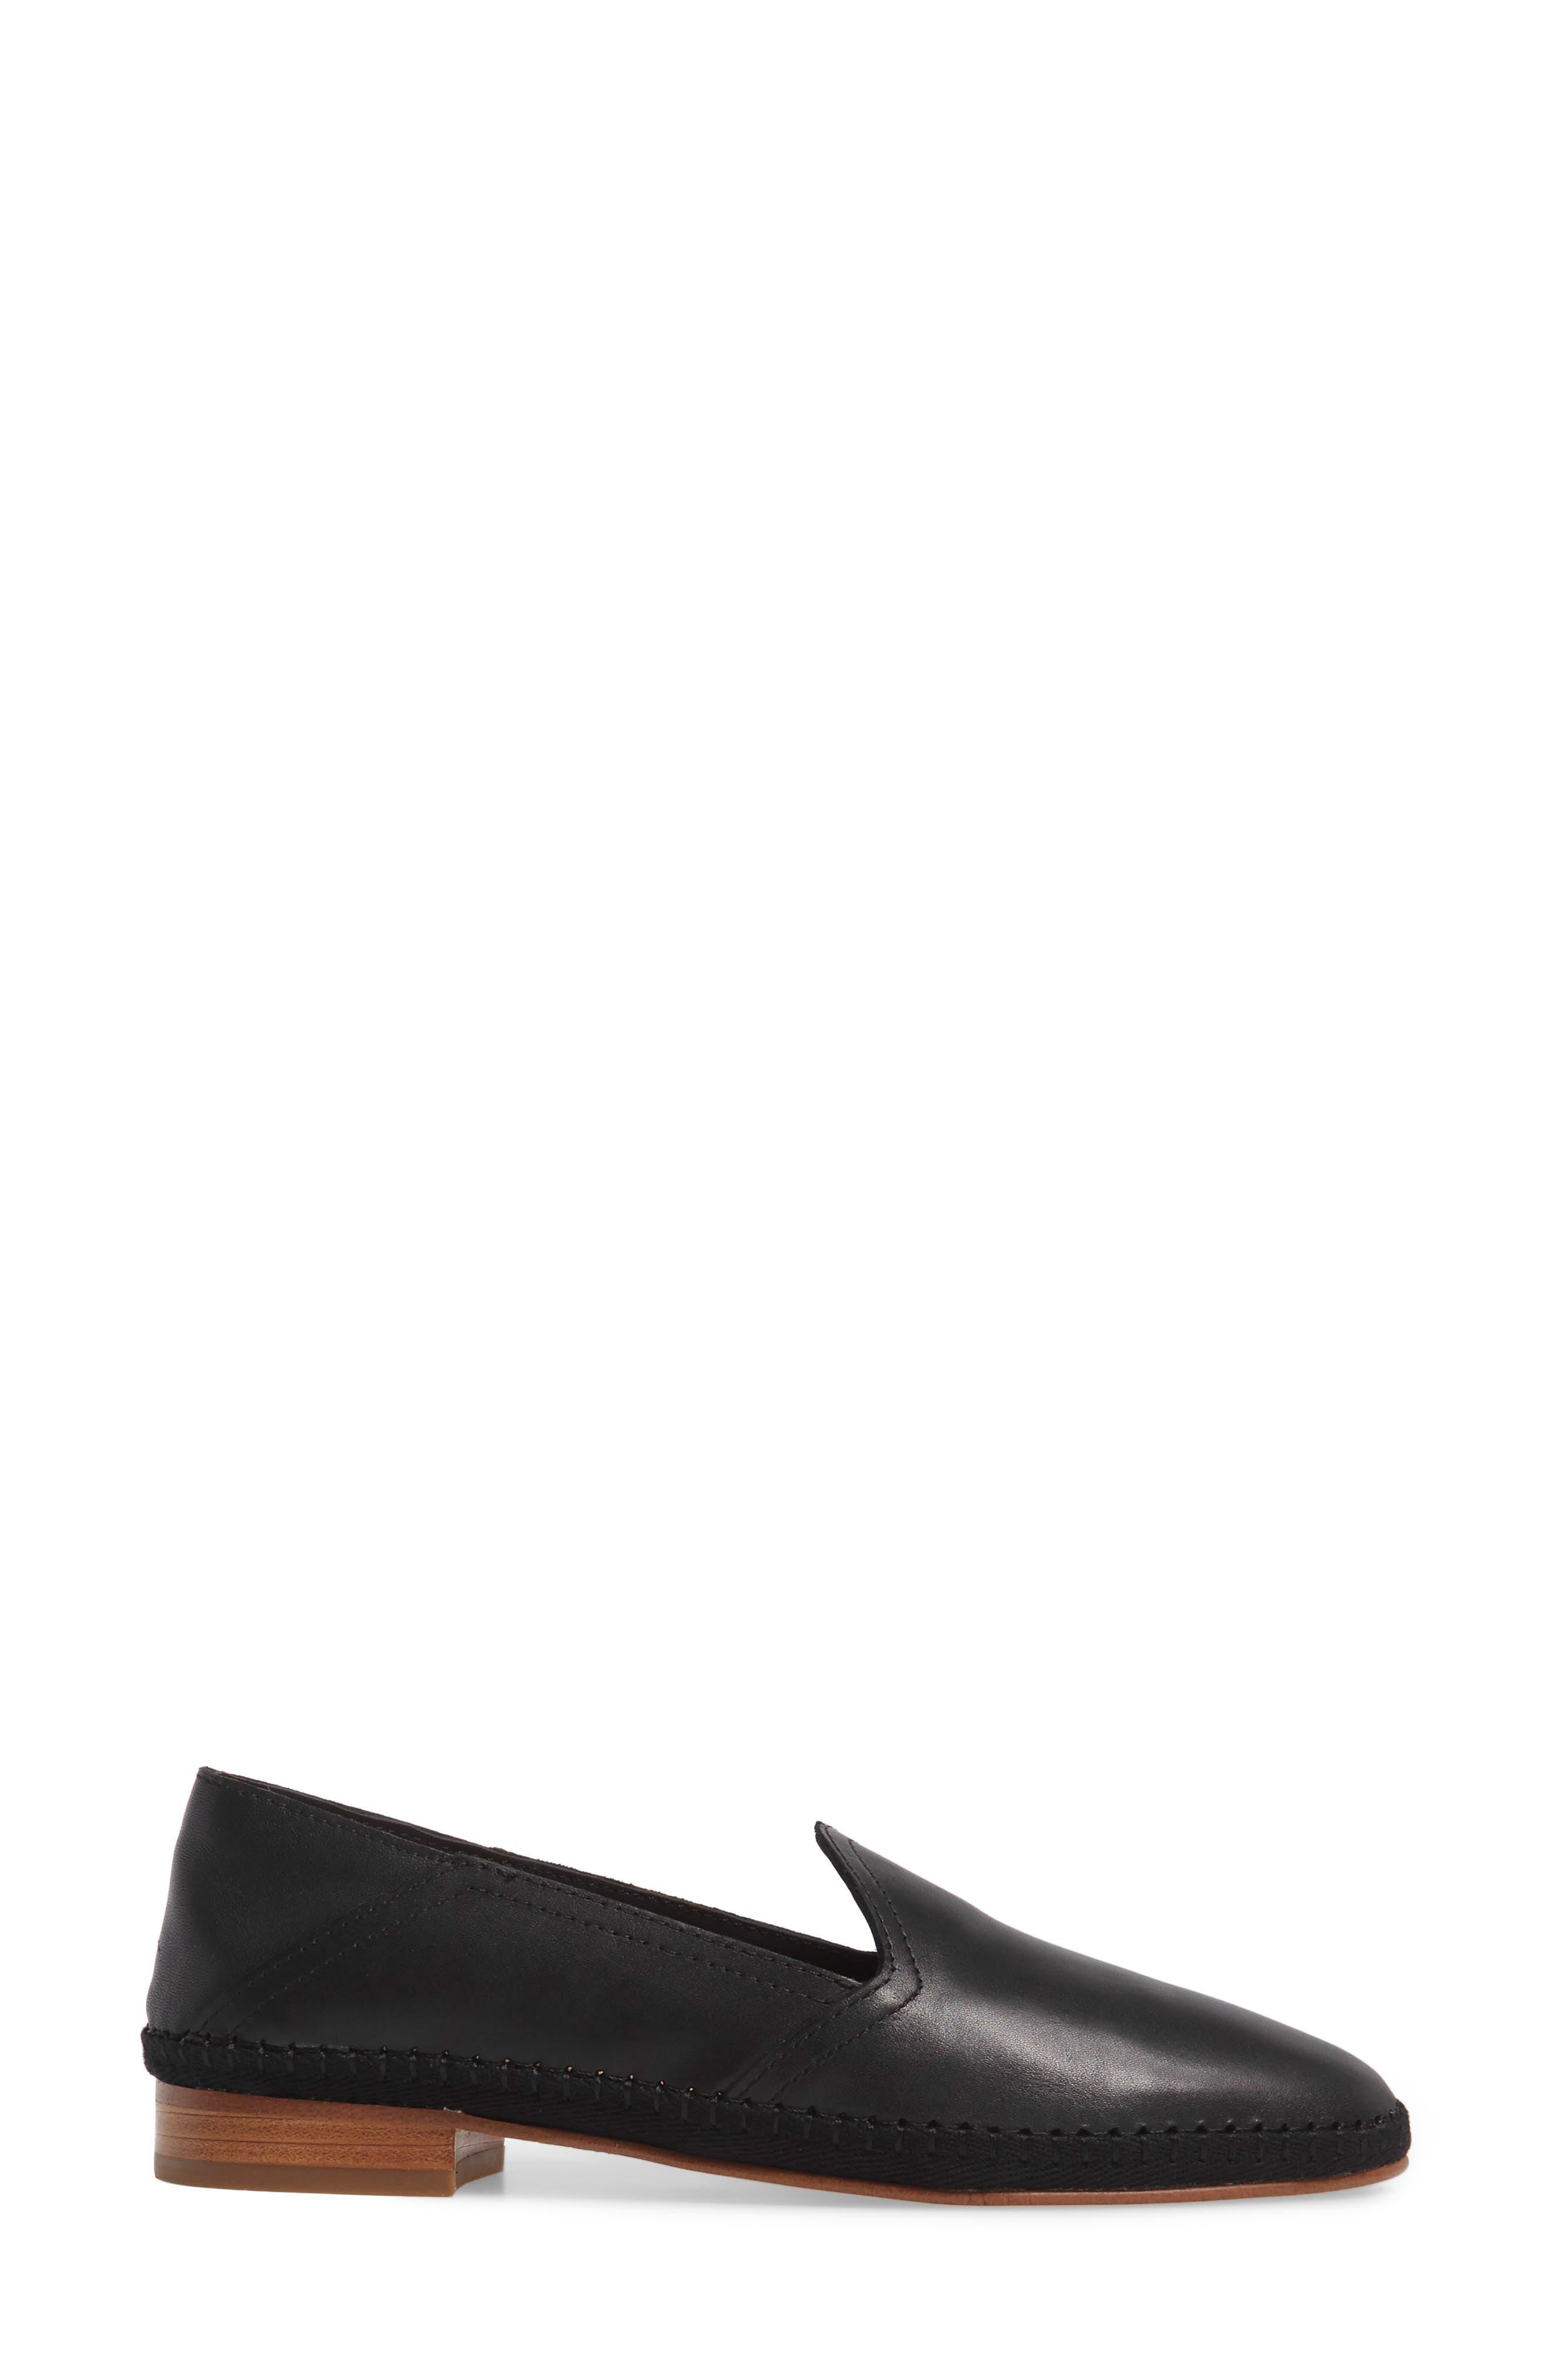 Soludus Convertible Venetian Loafer,                             Alternate thumbnail 4, color,                             001